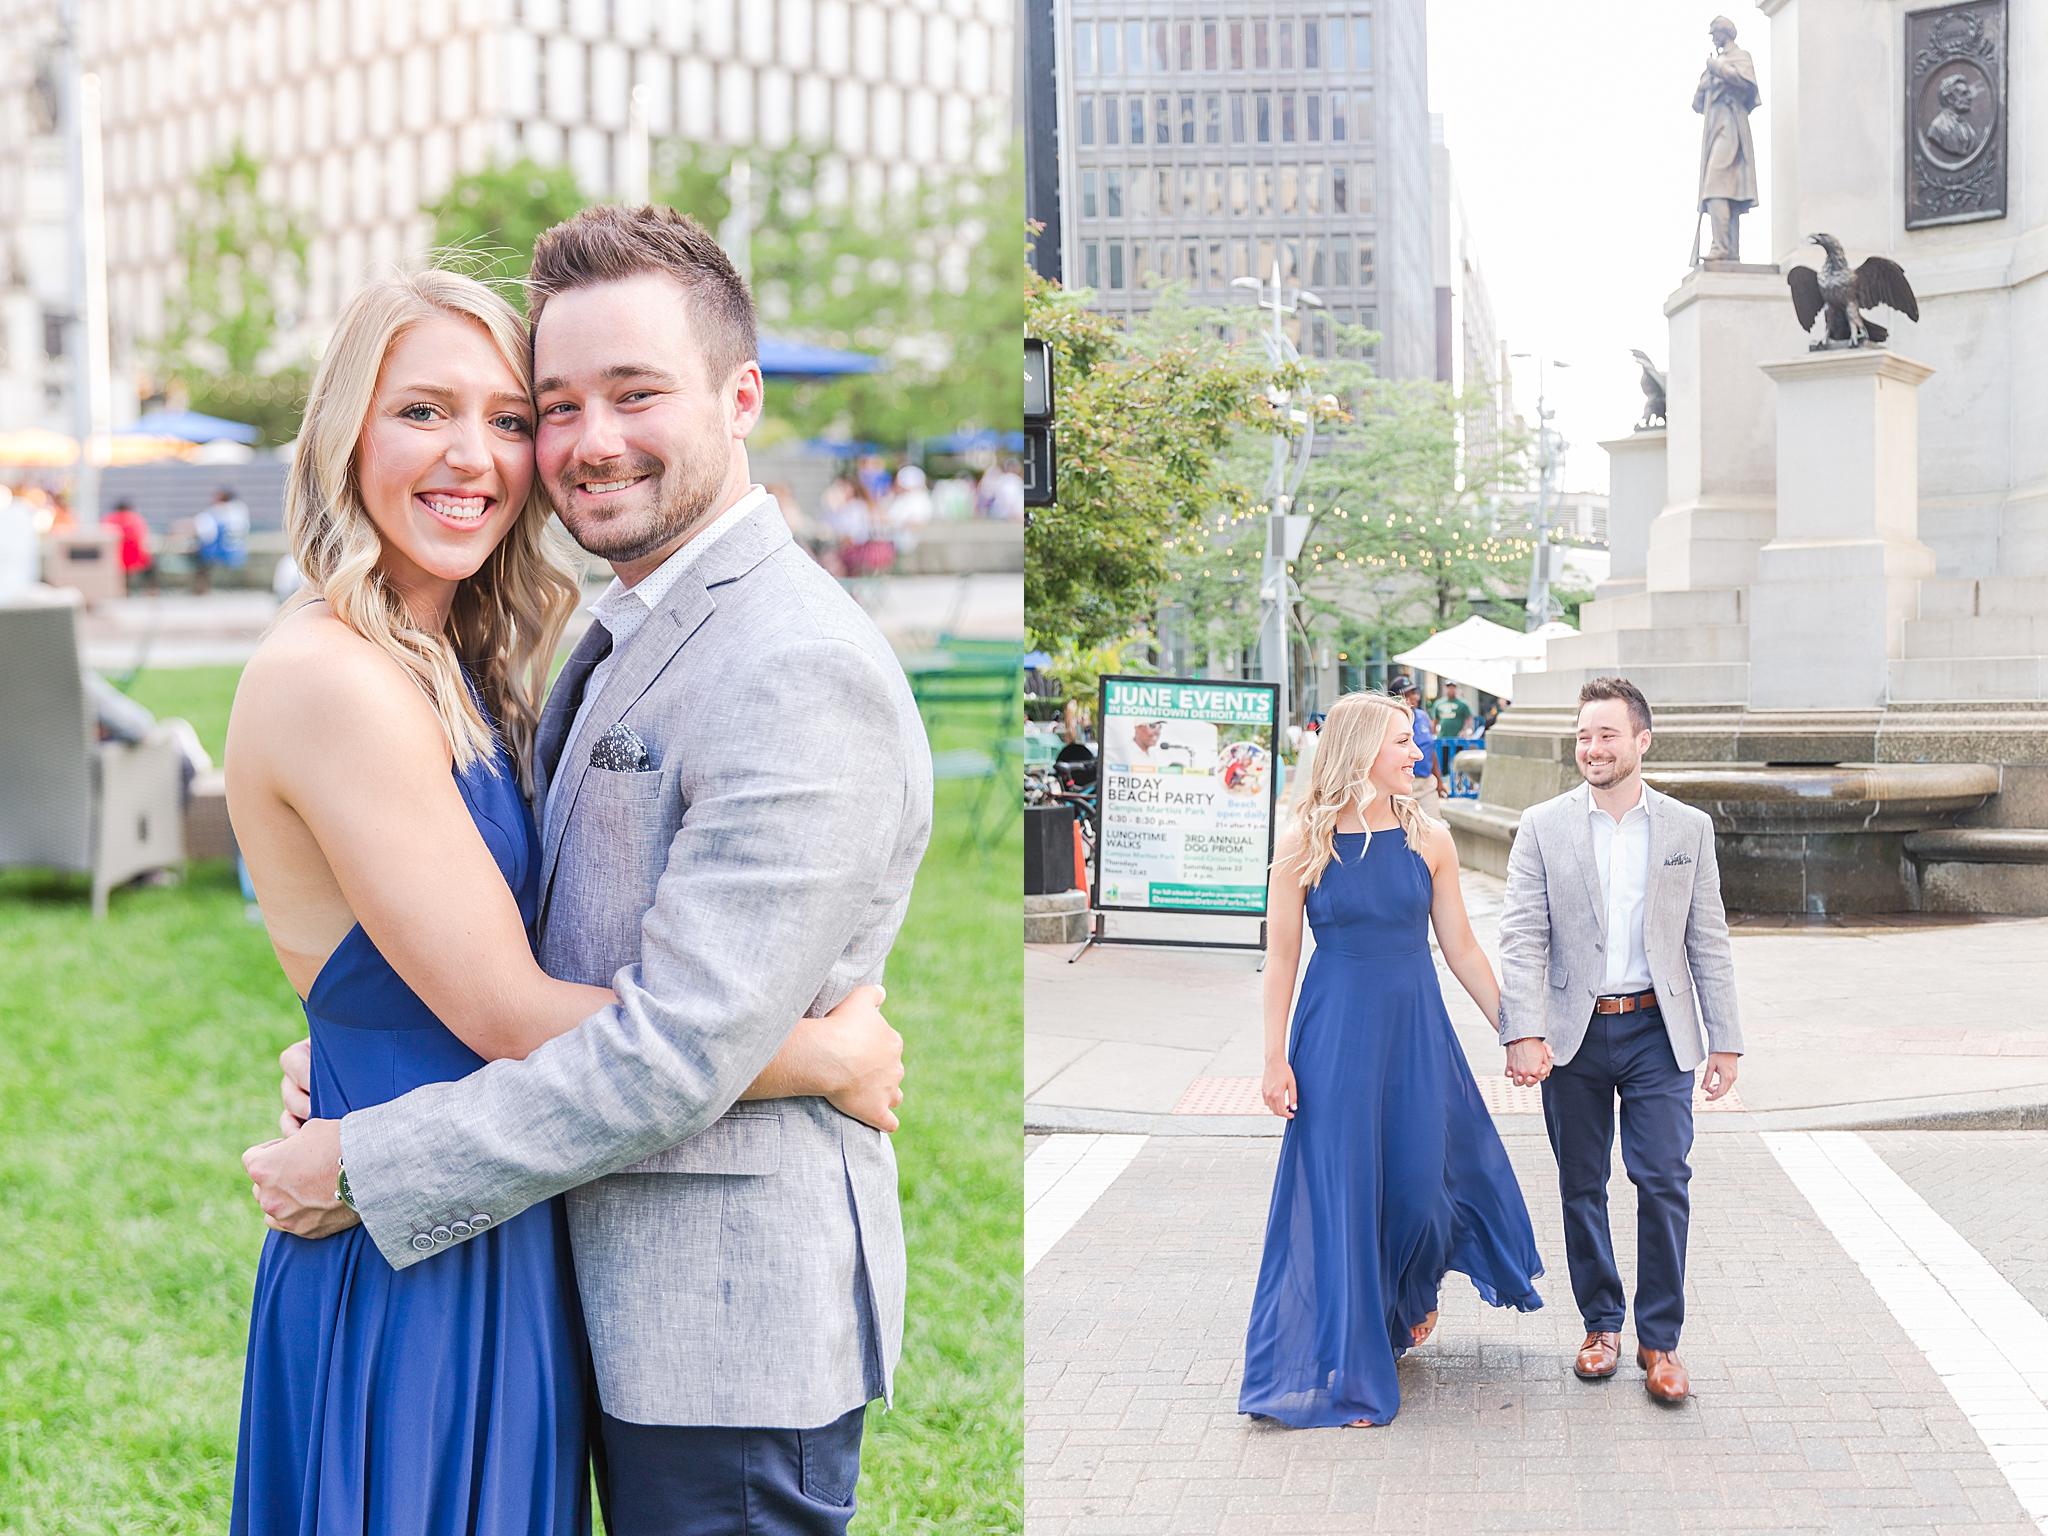 detroit-wedding-photographer-downtown-detroit-belle-isle-engagement-photos-sarah-eric-by-courtney-carolyn-photography_0019.jpg